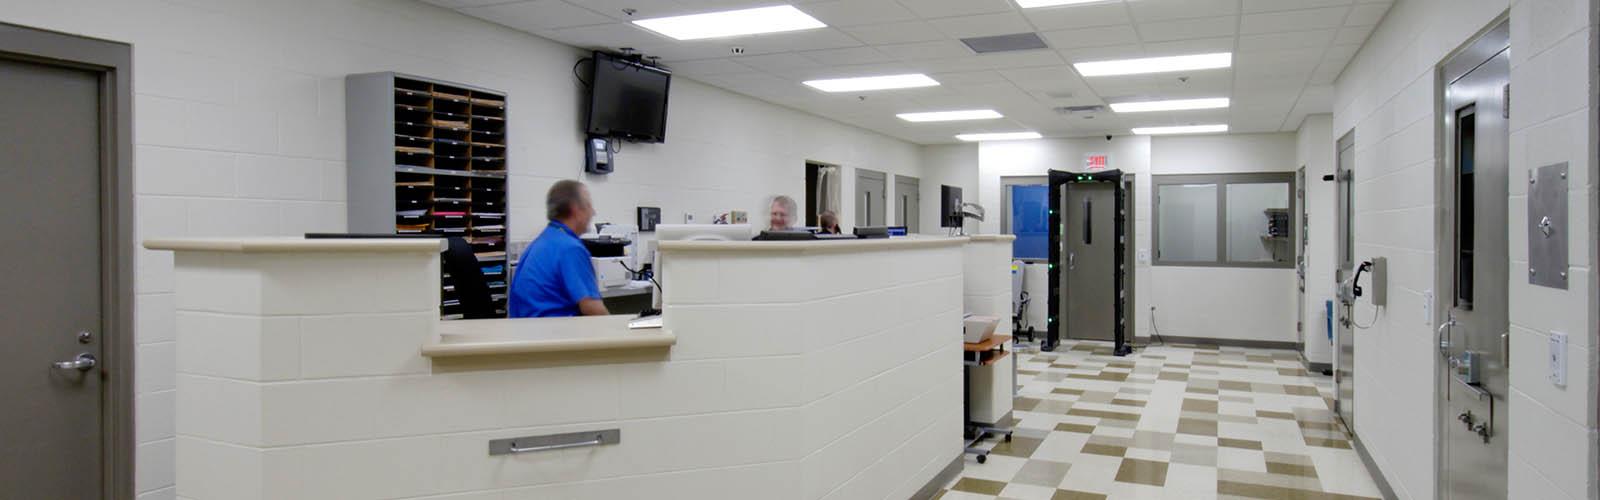 Henry County Detention Center 2